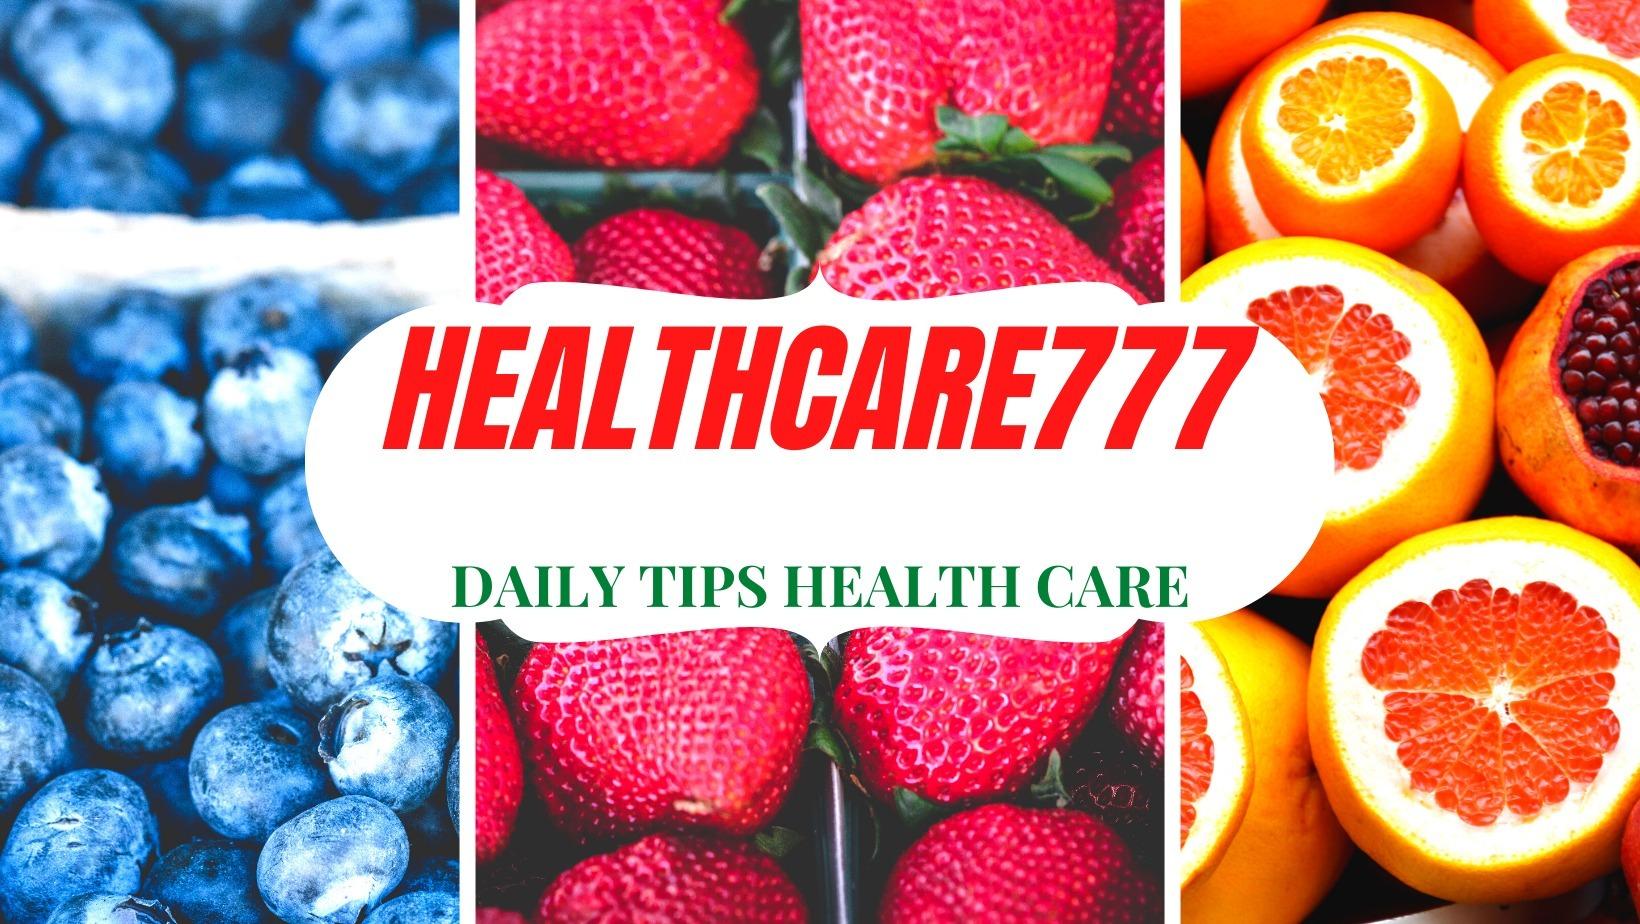 healthcare 777 (@healthcare777) Cover Image